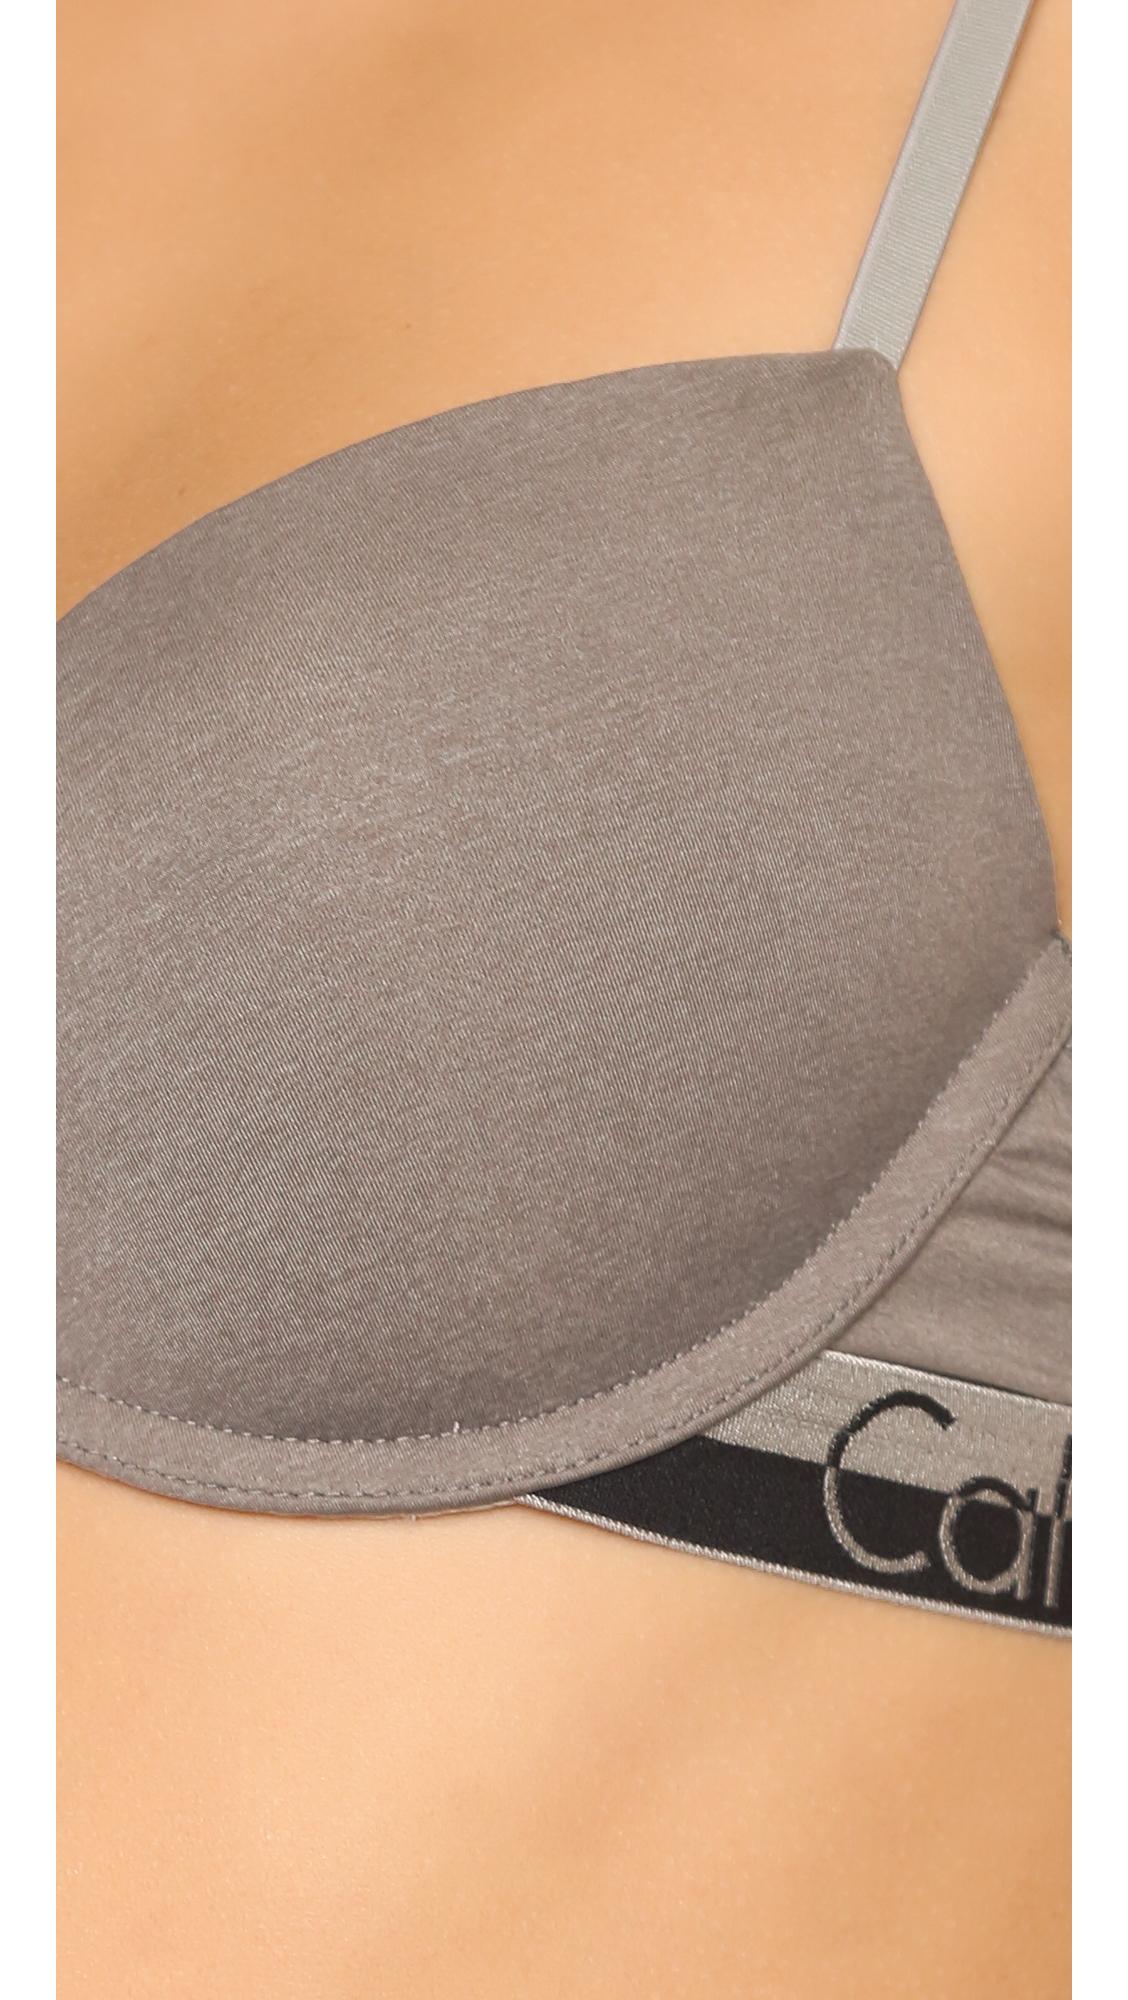 29f8508df92f6 Lyst - Calvin Klein Magnetic Force Flirty Push Up Bra in Gray